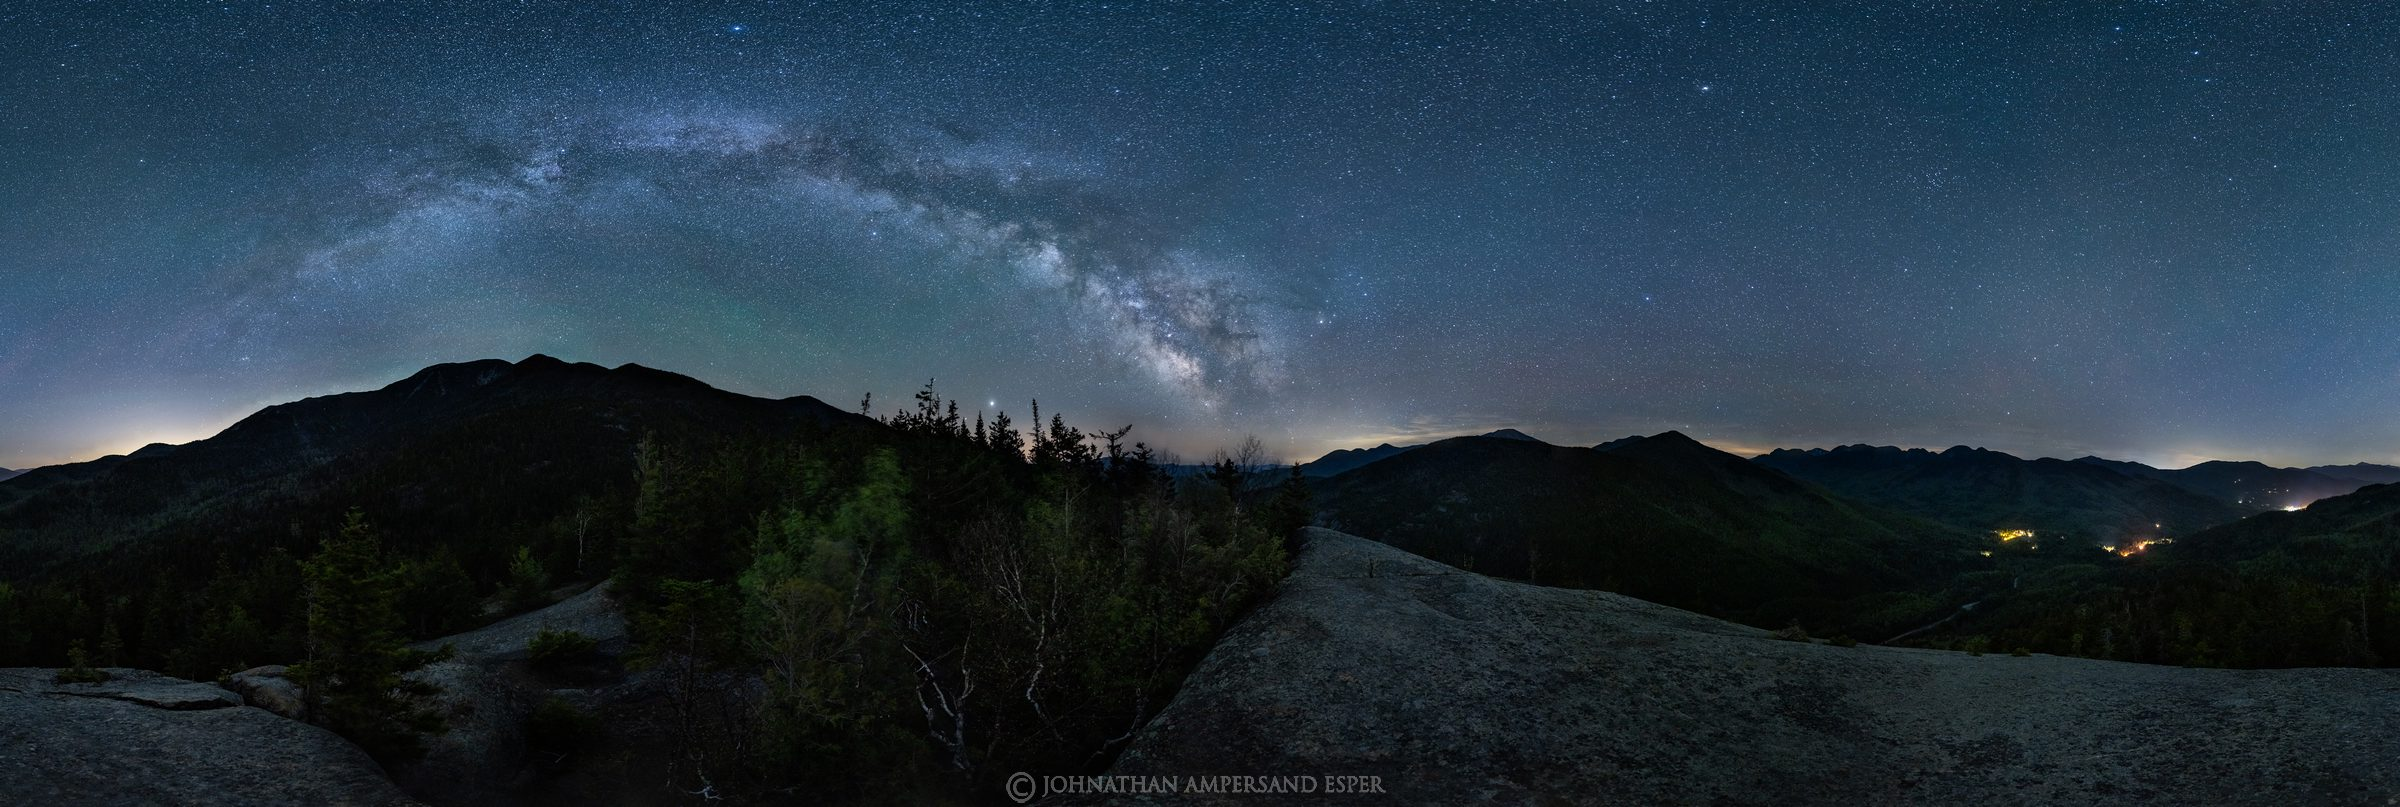 360 degree panorama,panorama,360 panorama,Giant Mt,Milky Way,night,stars,Keene Valley,High Peaks,The Nubble,Nubble,Giants Nubble...